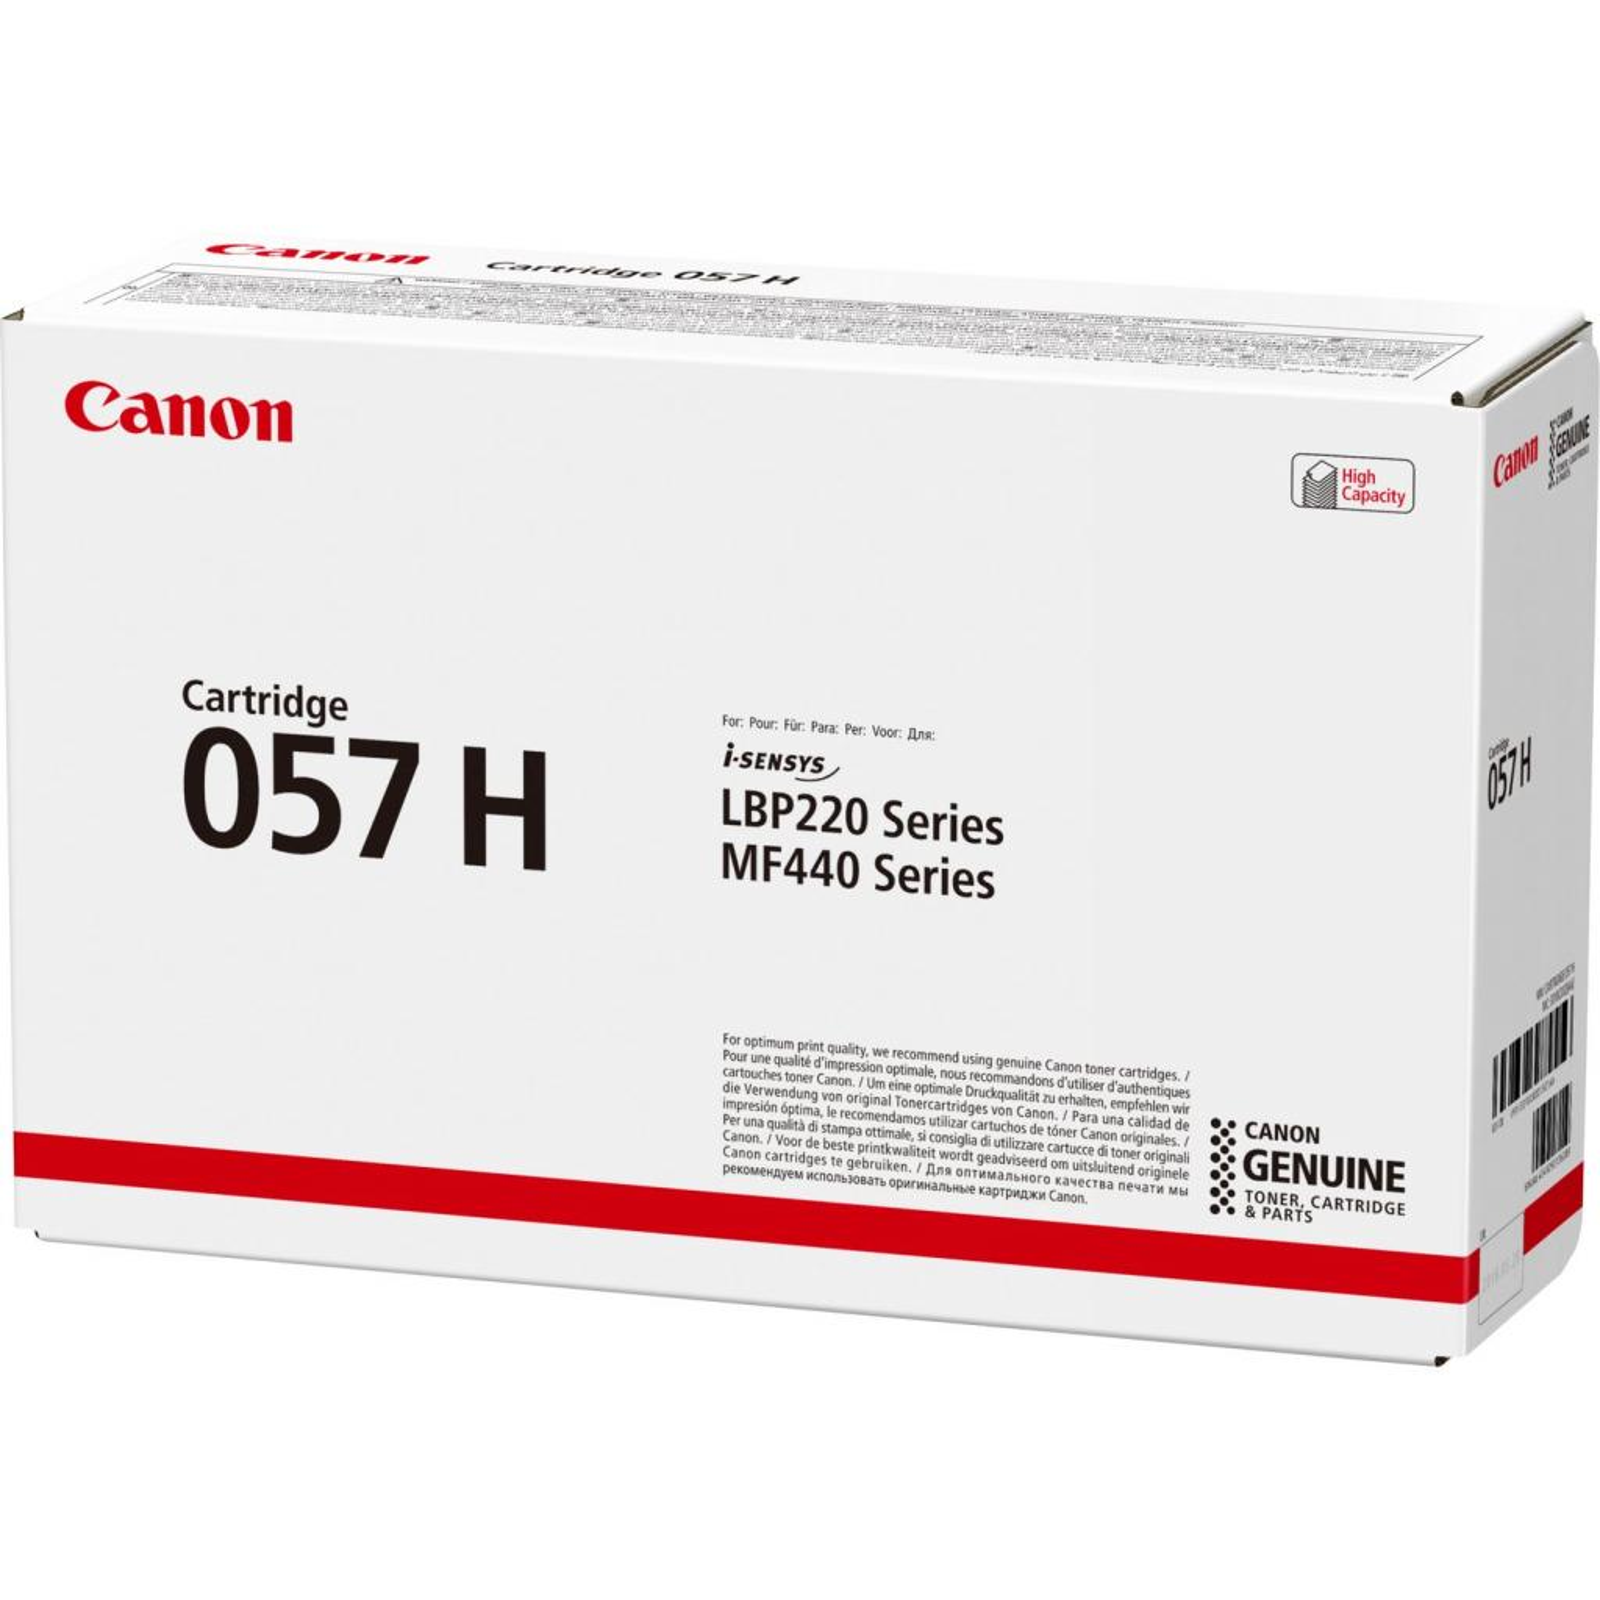 Картридж Canon 057 Black 3.1K (3009C002) изображение 3